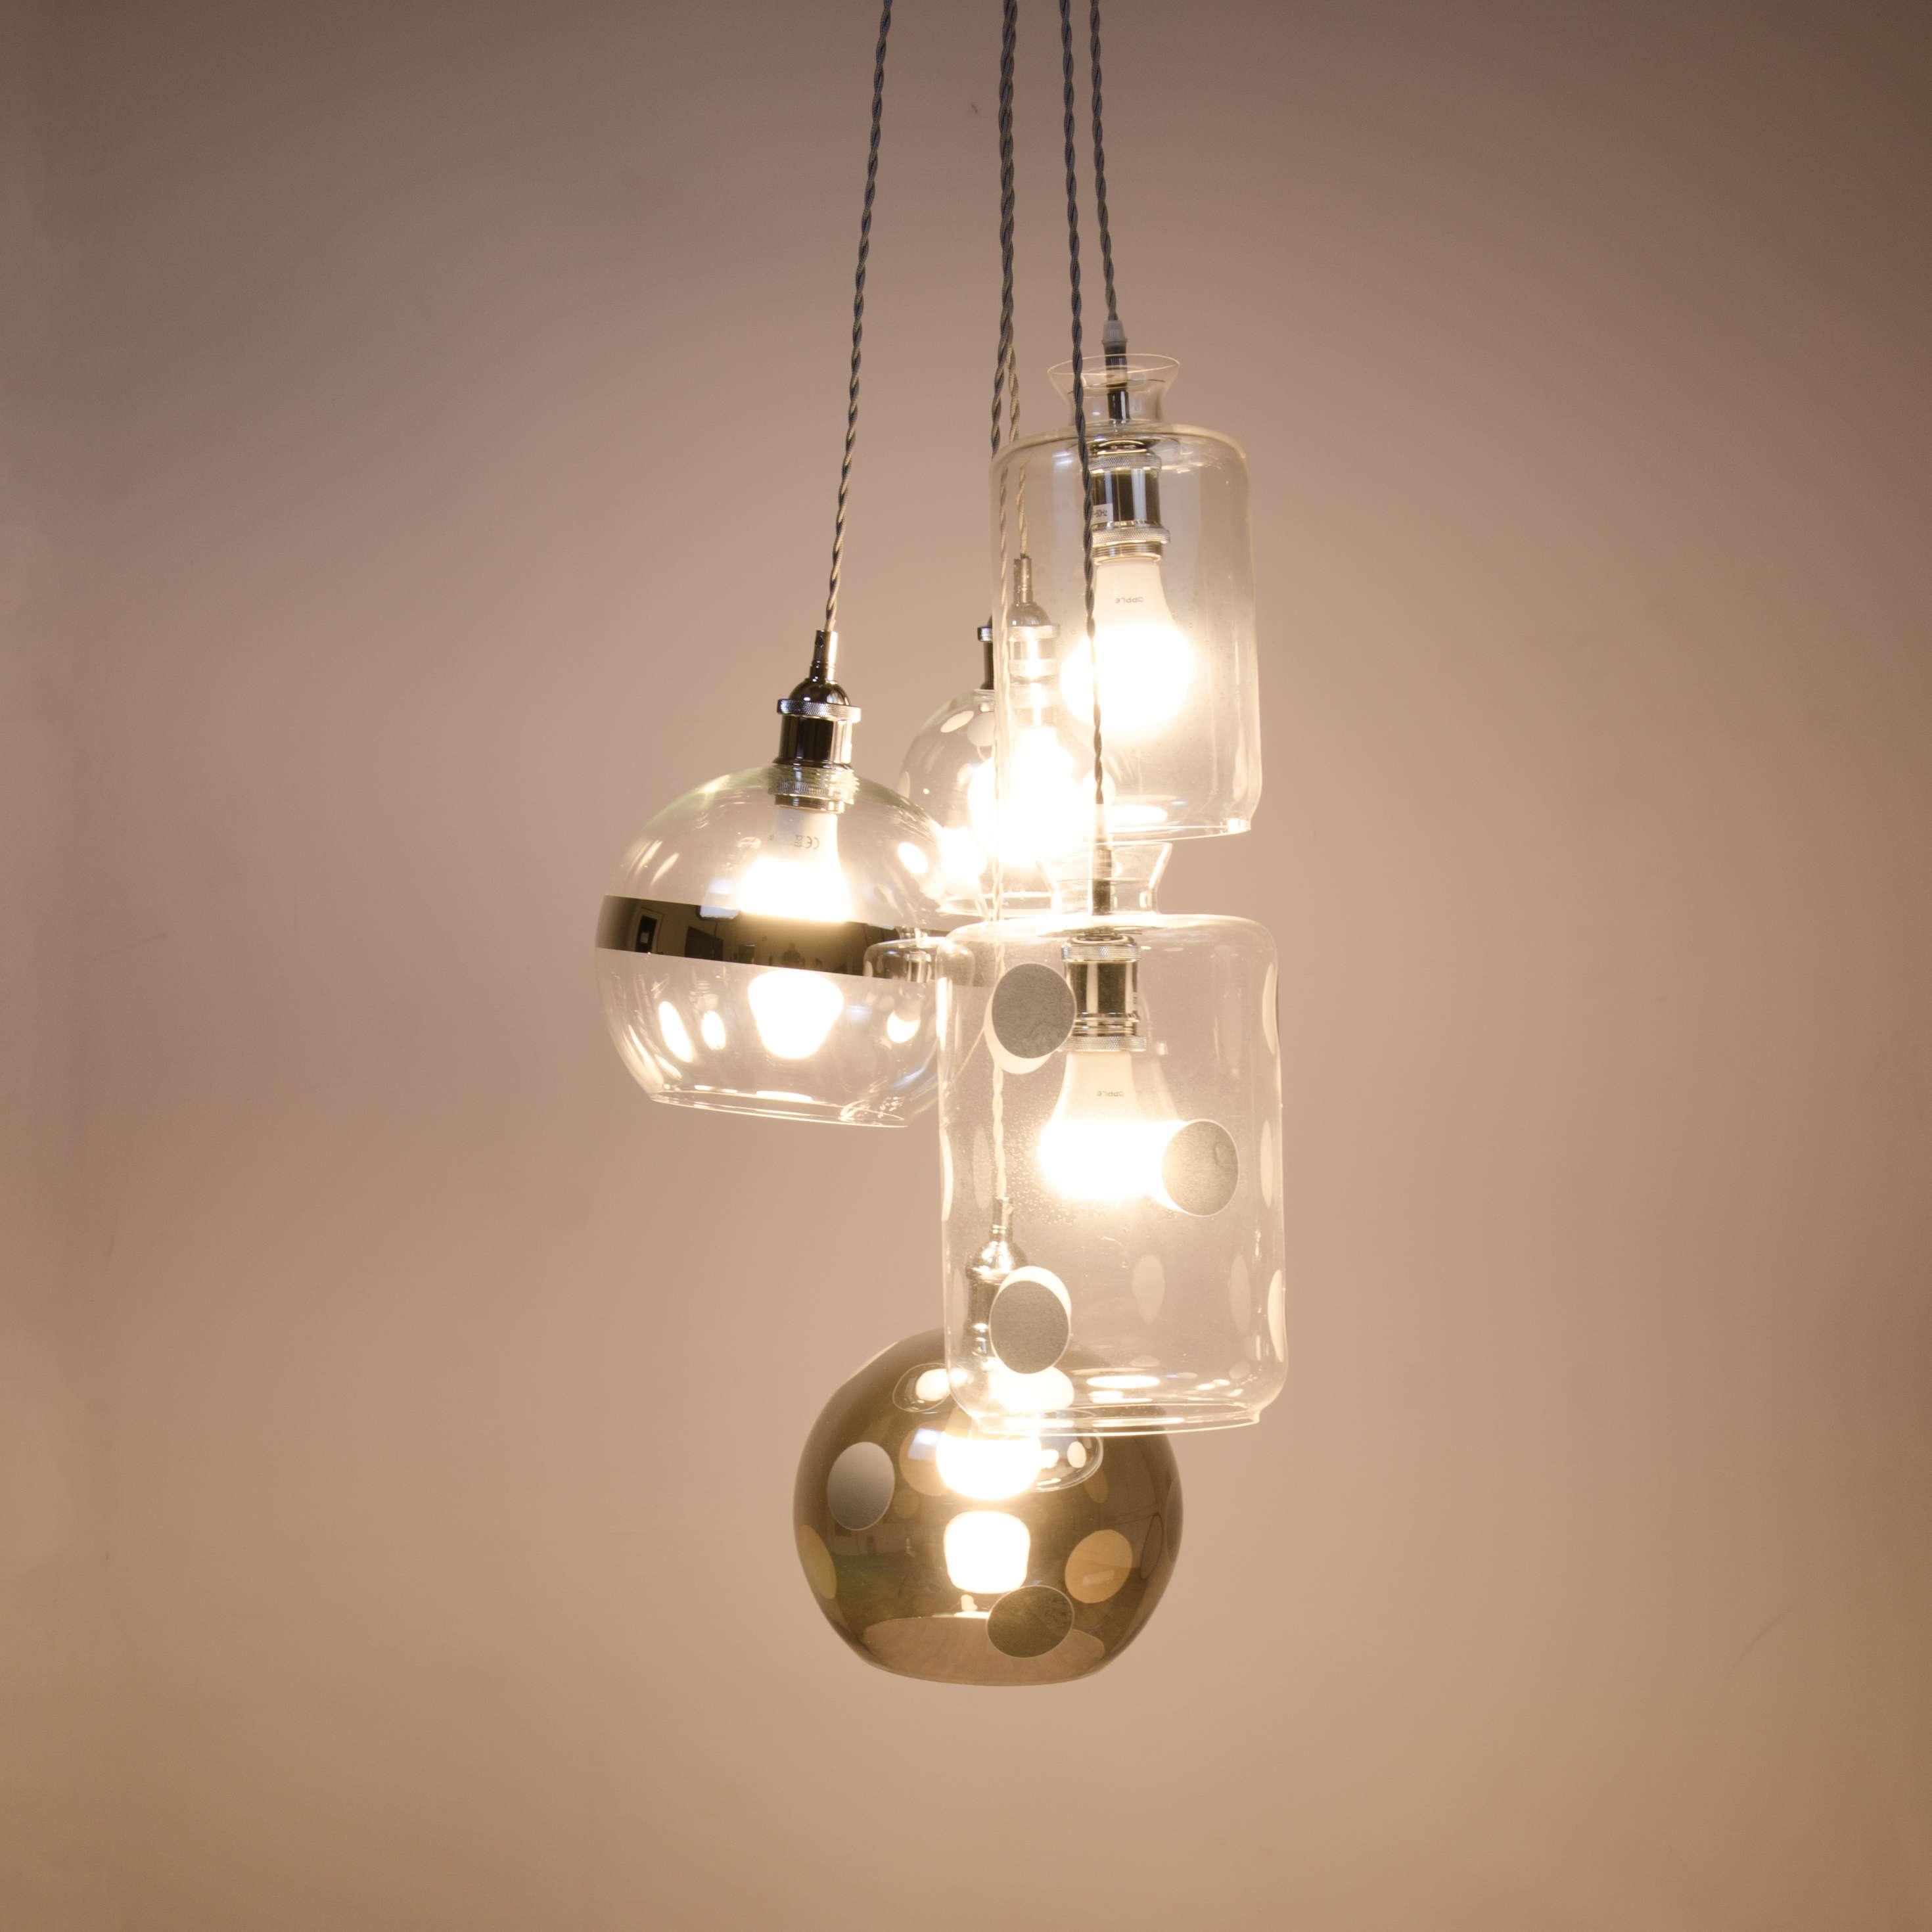 impressionen deckenleuchte h ngeleuchte leuchte lampe glas. Black Bedroom Furniture Sets. Home Design Ideas